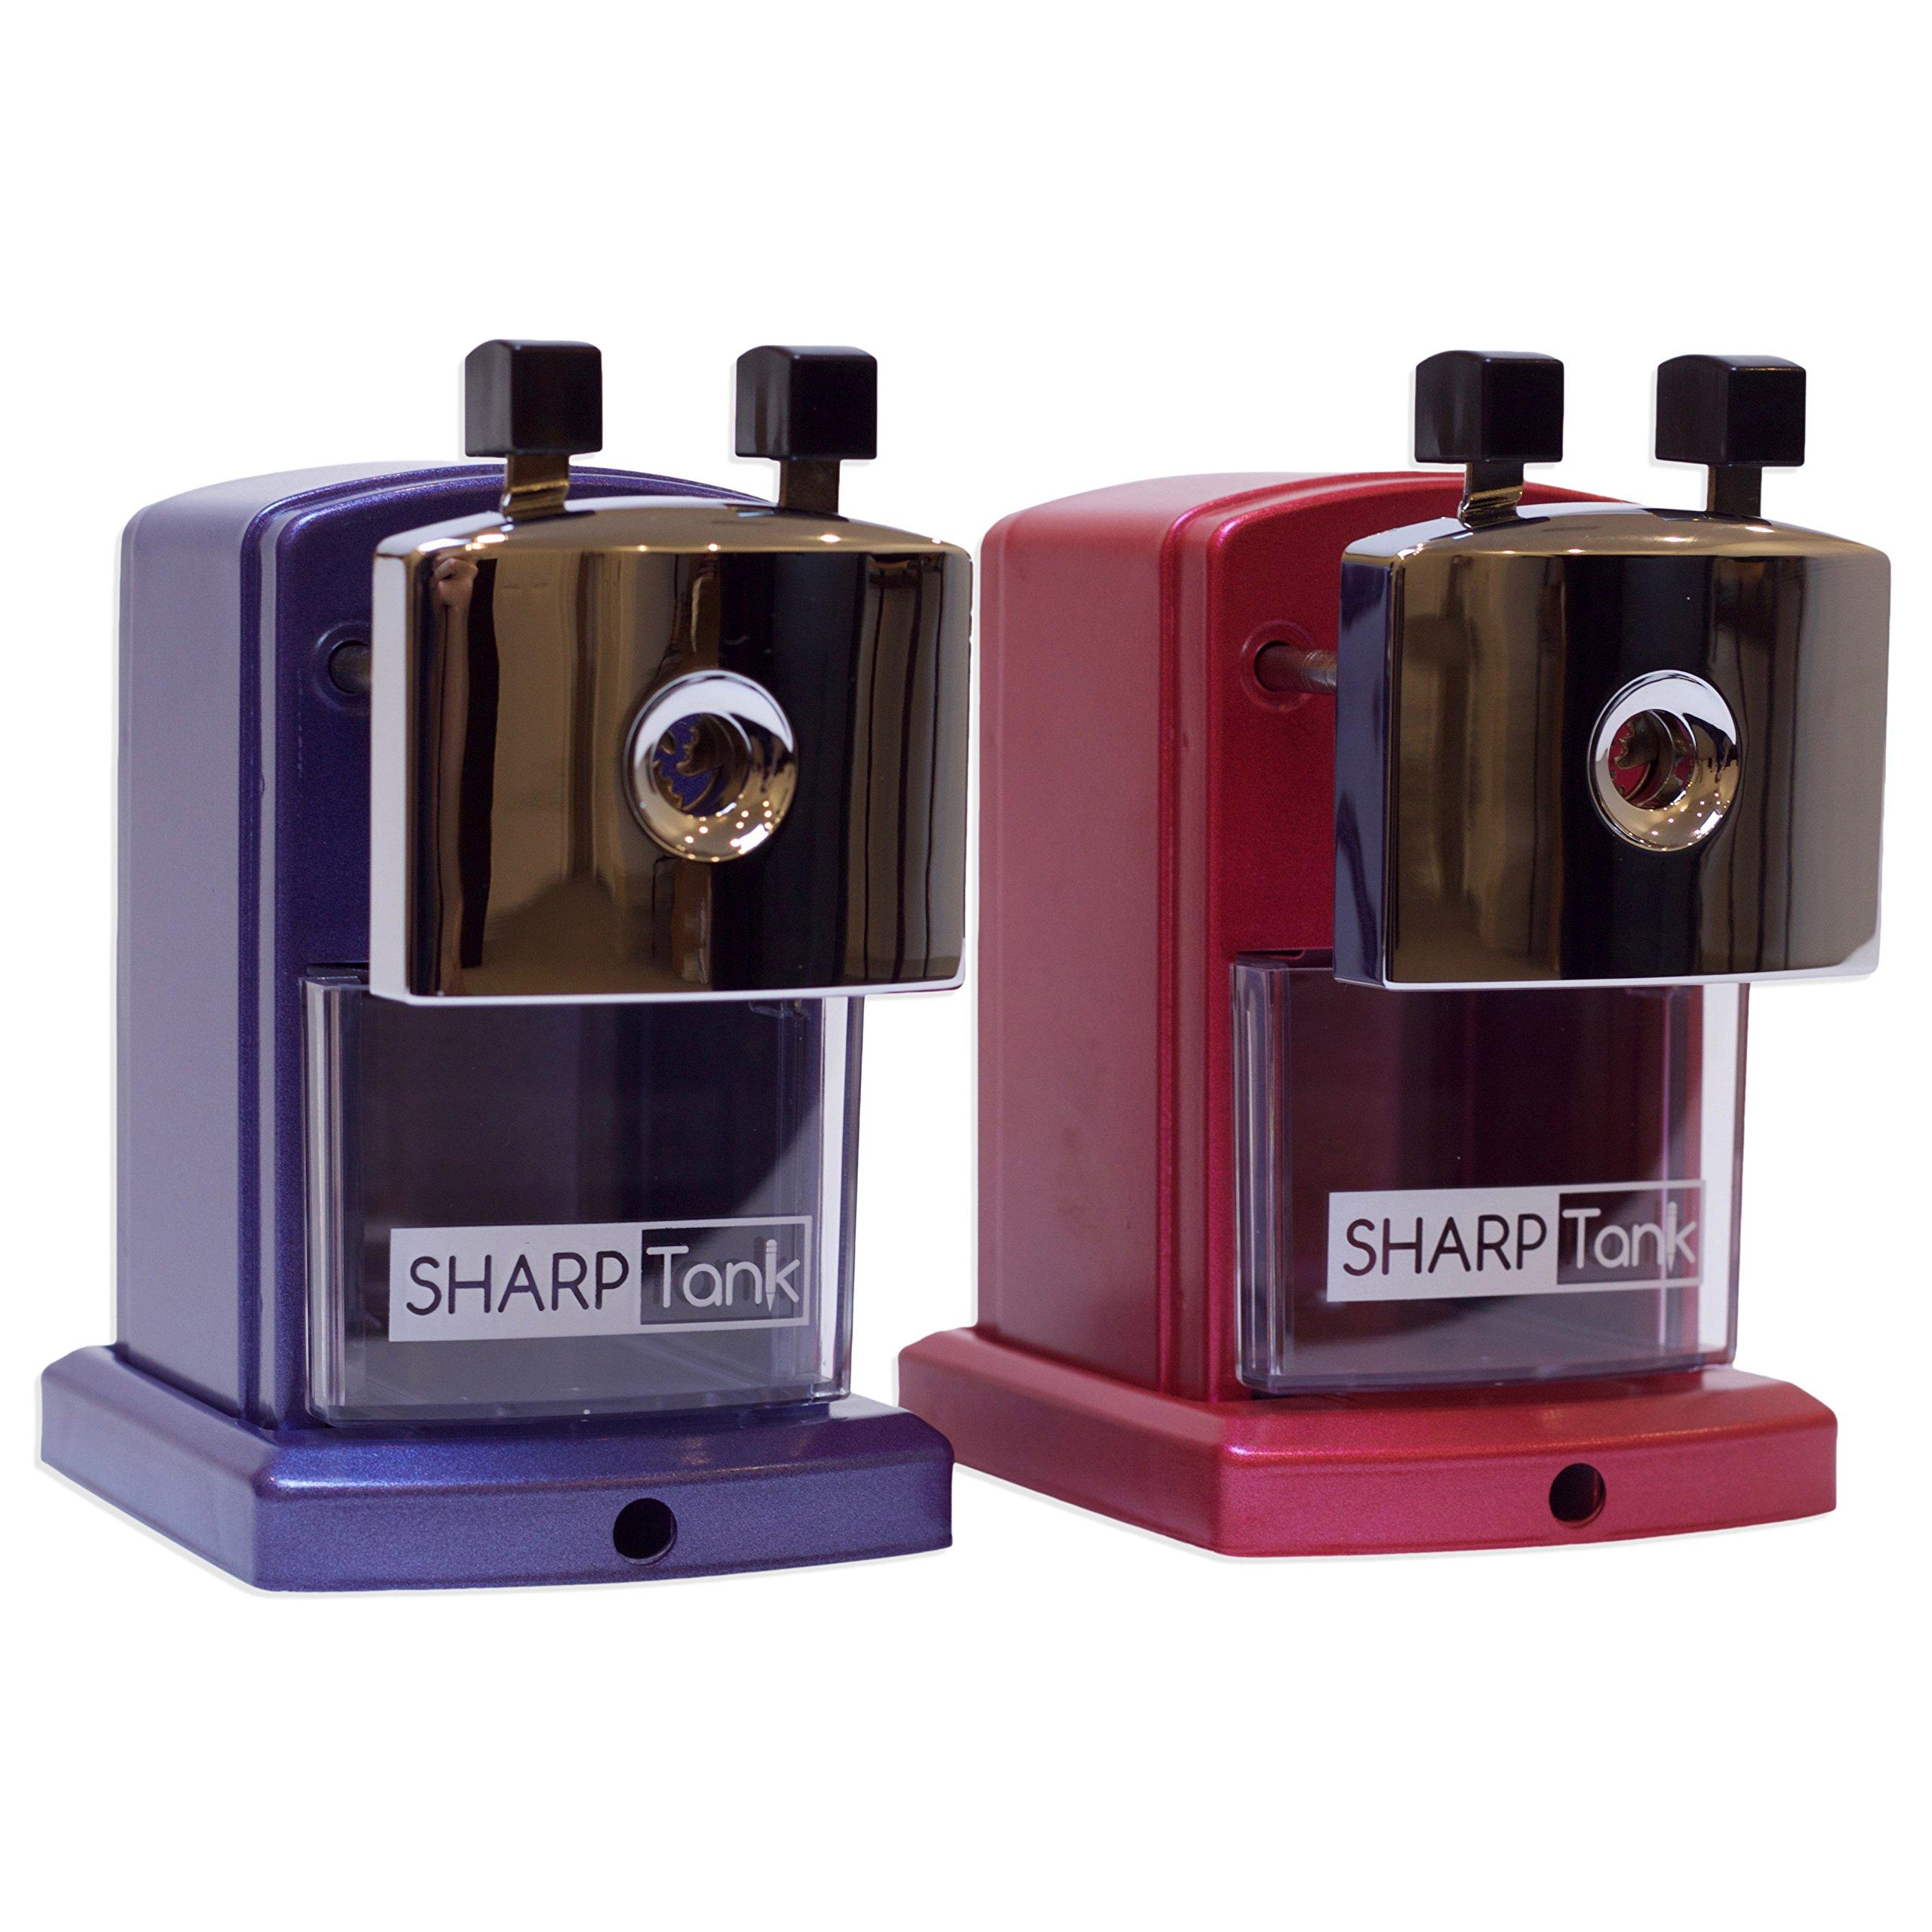 SharpTank Twin Pack - Includes Two Pencil Sharpeners (1 Metallic Rose & 1 Metallic Plum) by SHARP TANK